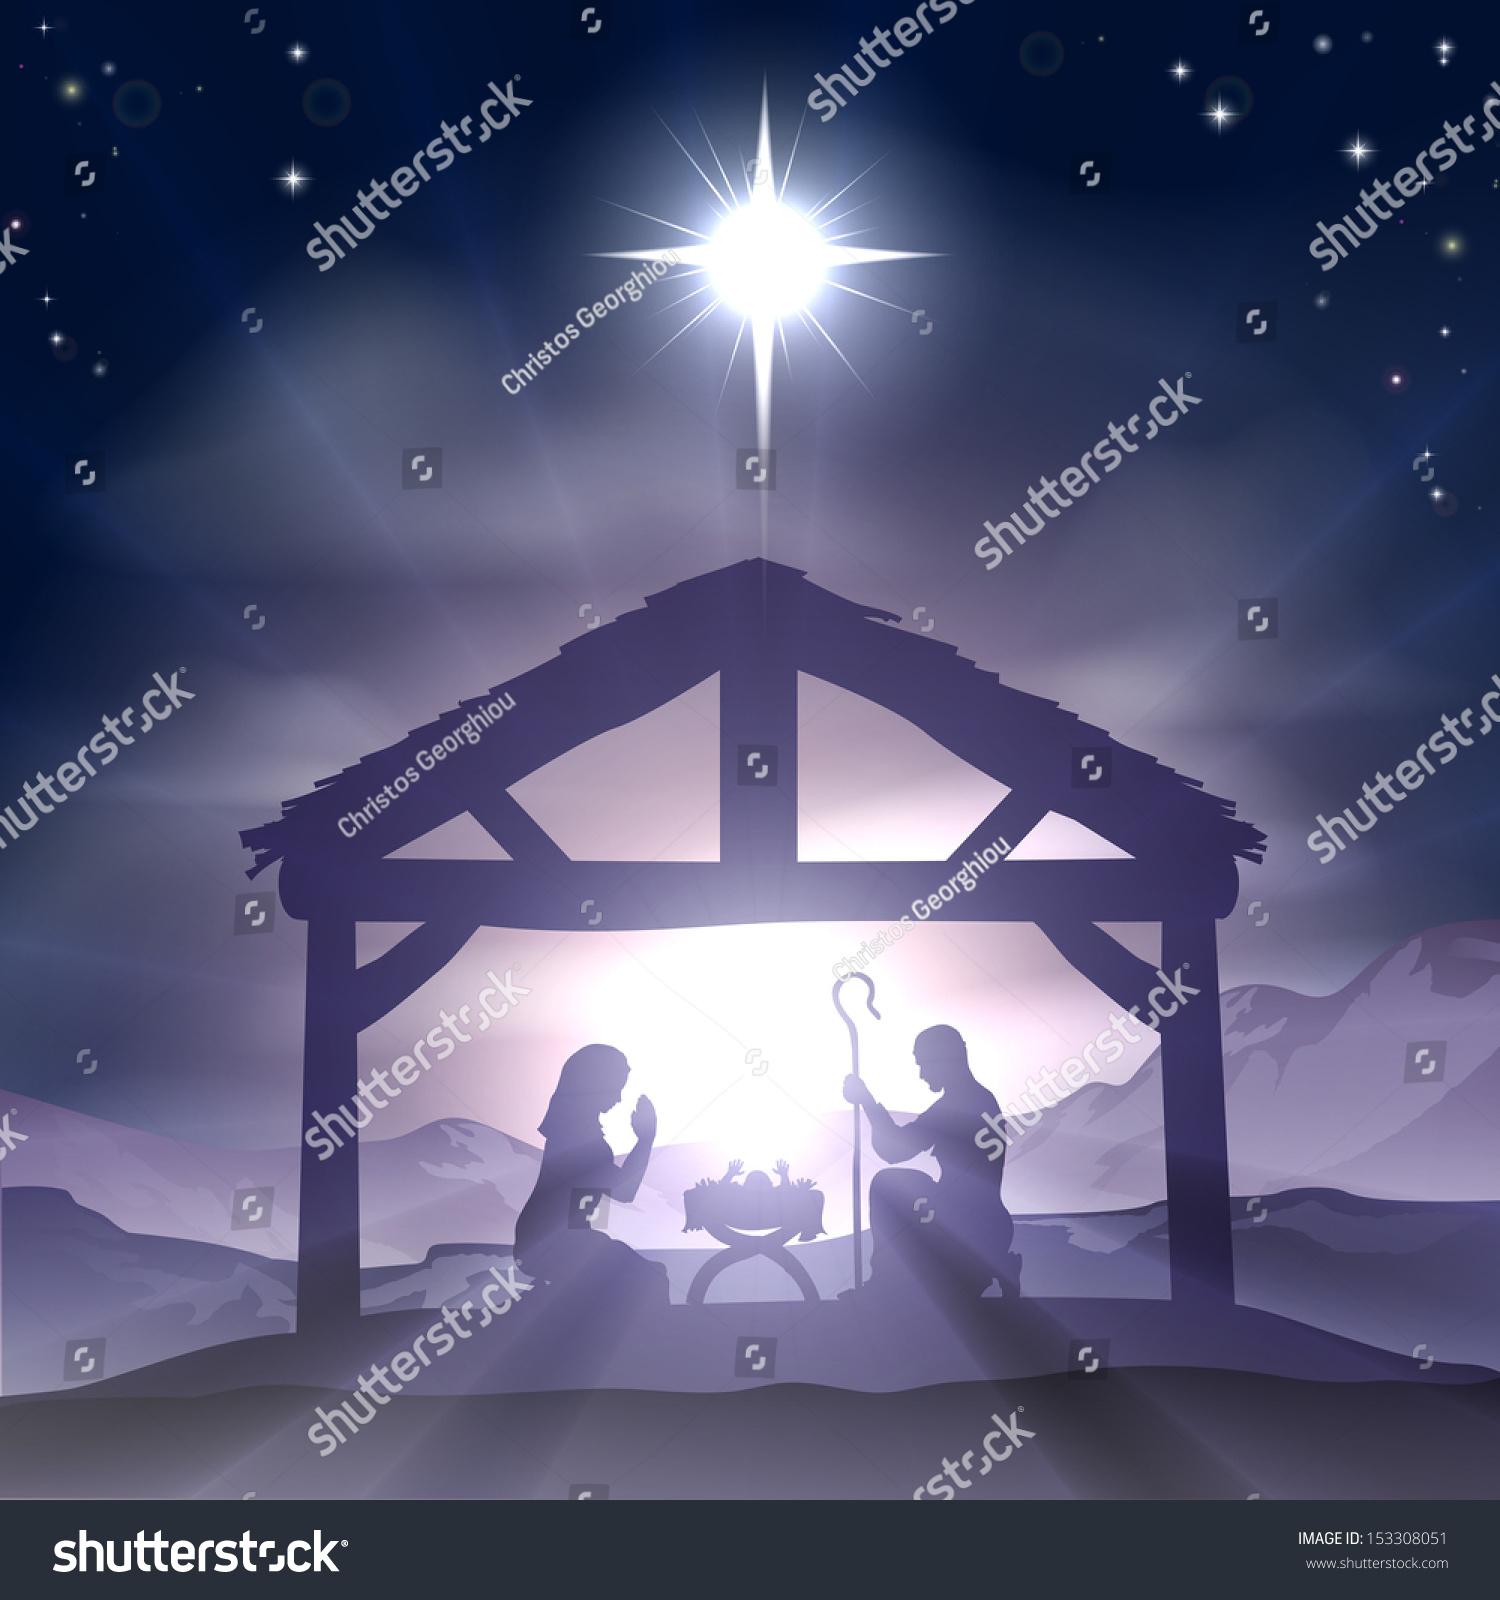 ... Jesus christmas christian nativity scene with baby jesus in the